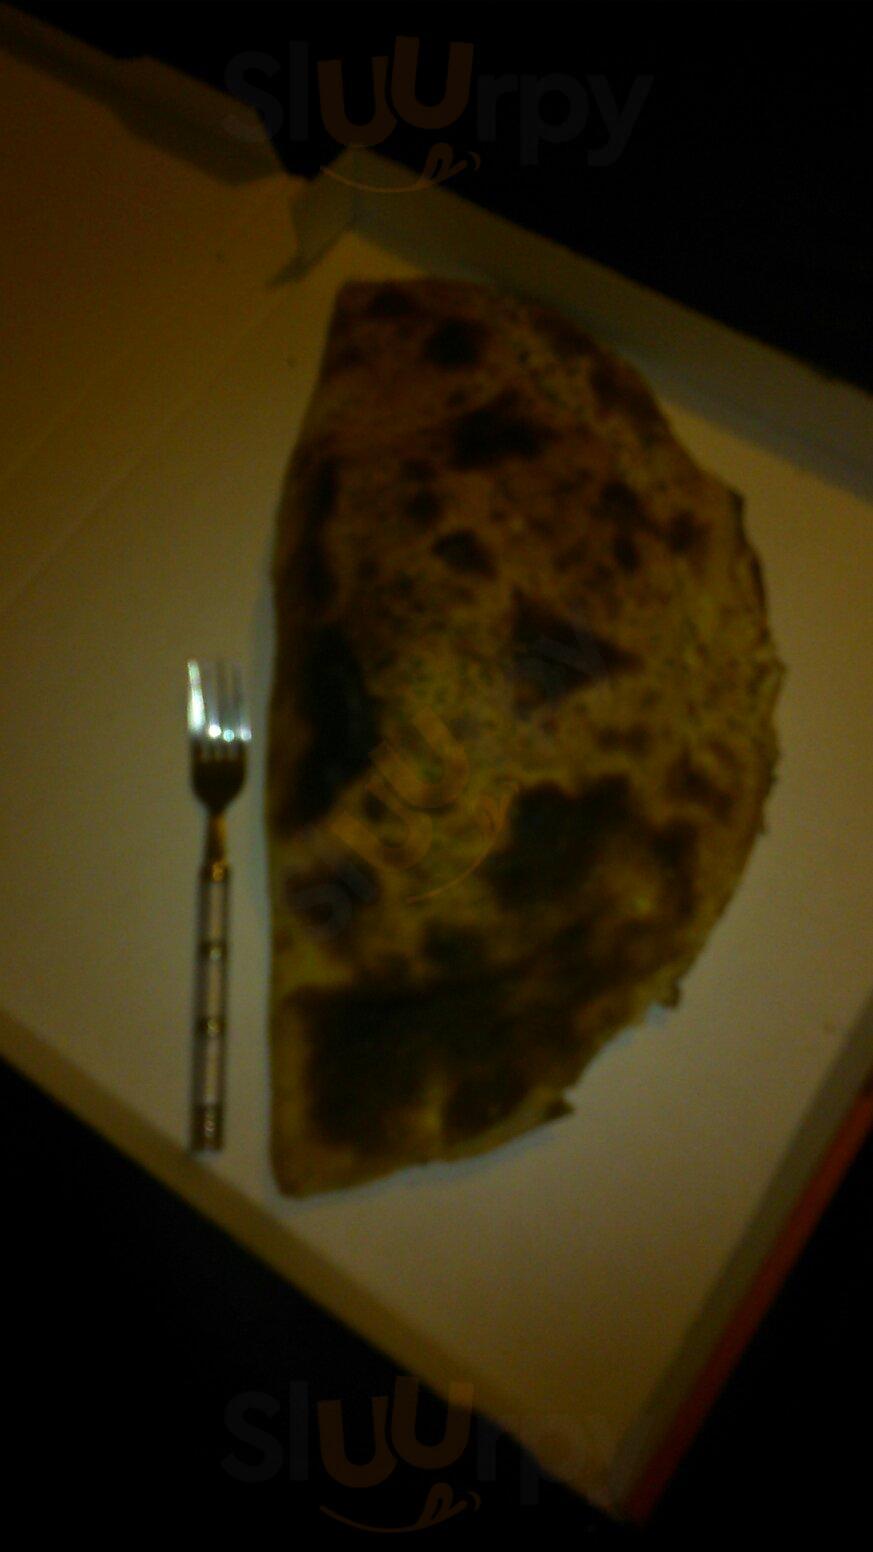 Hot Pizza, Brest